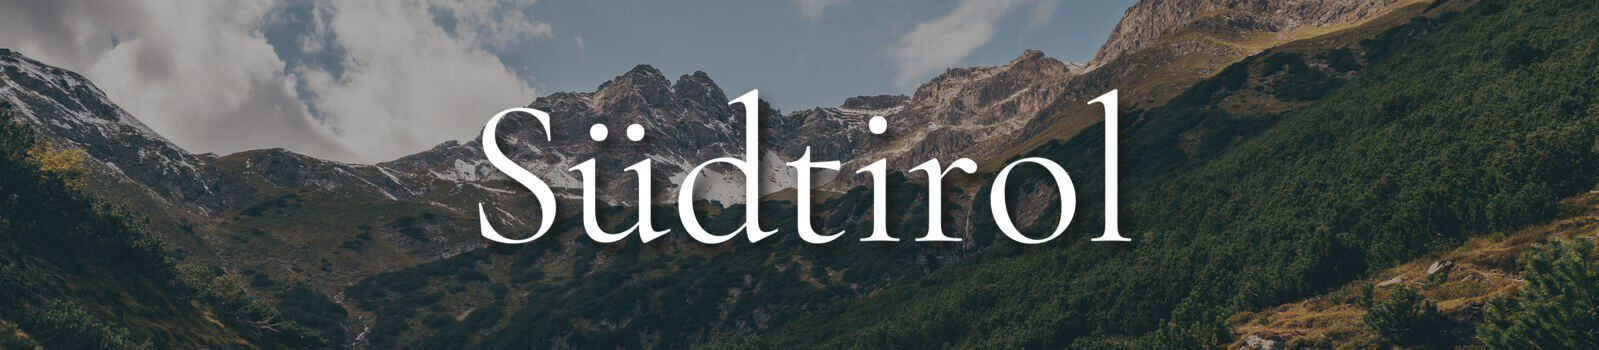 Urlaub Südtirol Banner